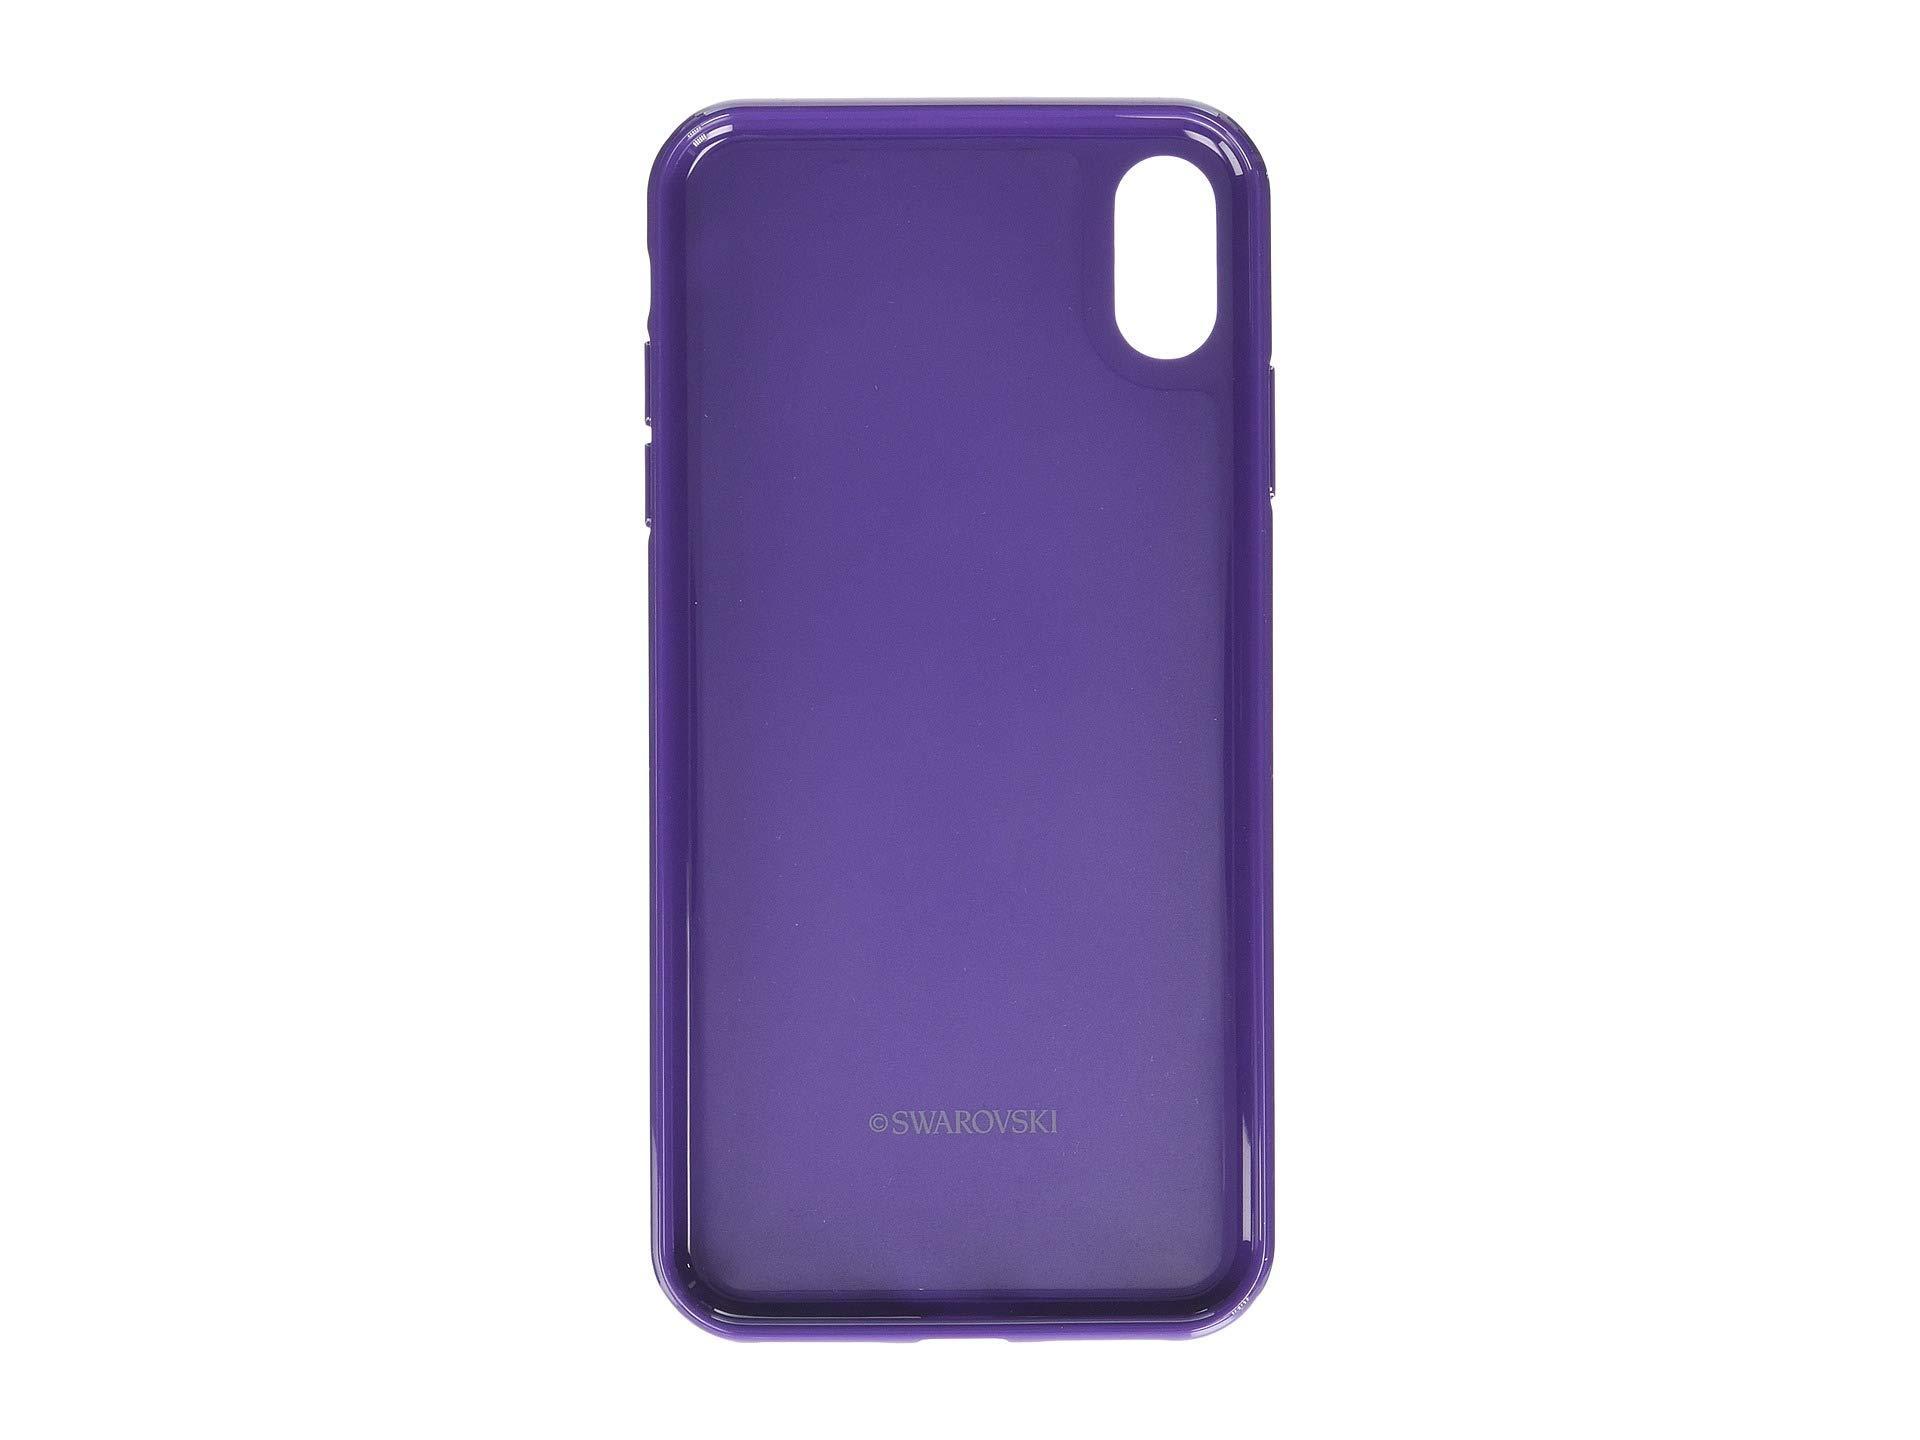 3b717880a9d5 Lyst - Swarovski Glam Rock Smartphone Case With Bumper